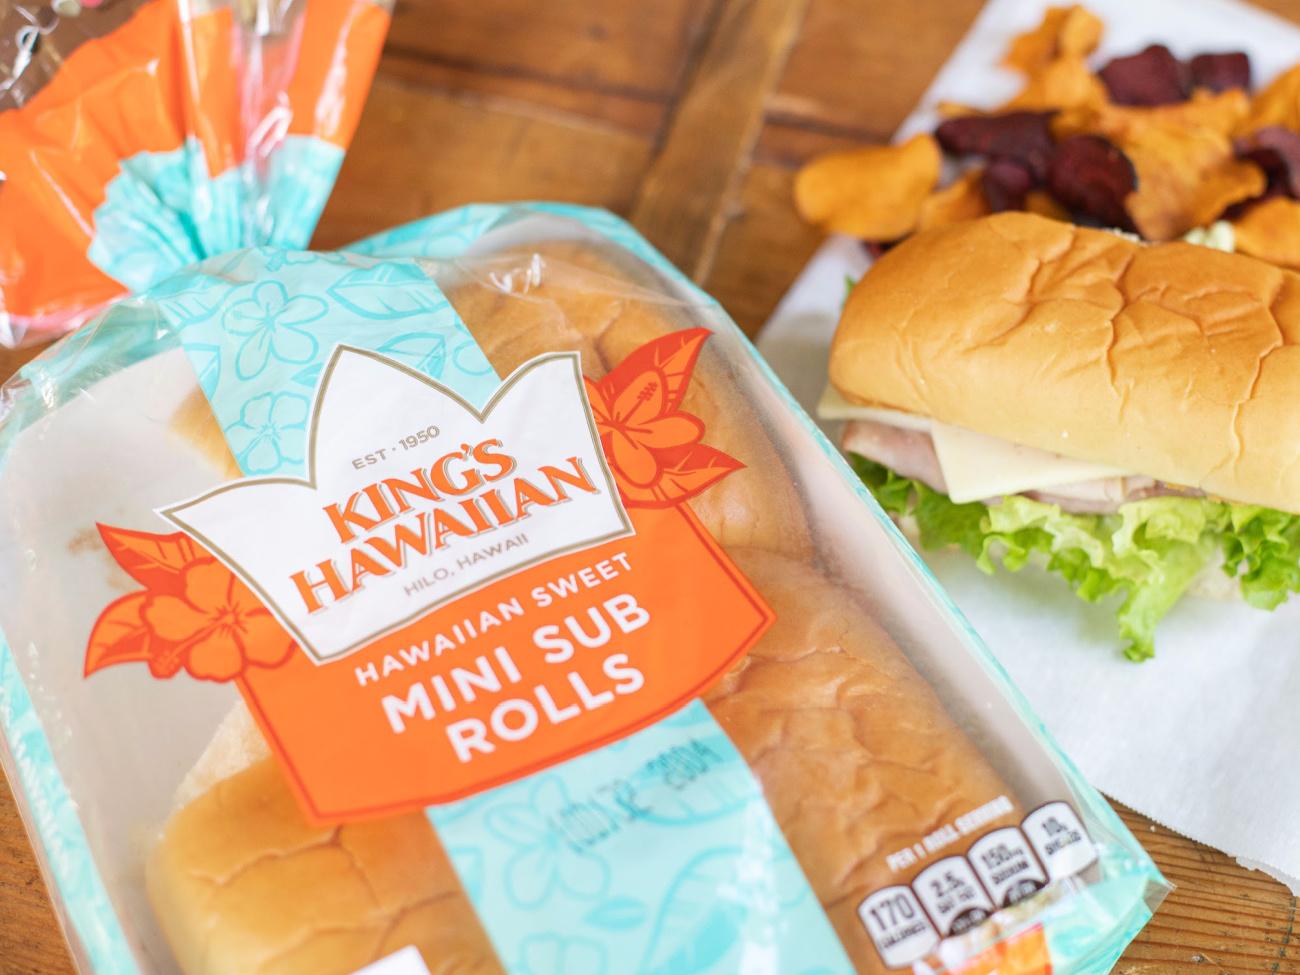 King's Hawaiian Mini Sub Rolls As Low As $1.10 At Publix on I Heart Publix